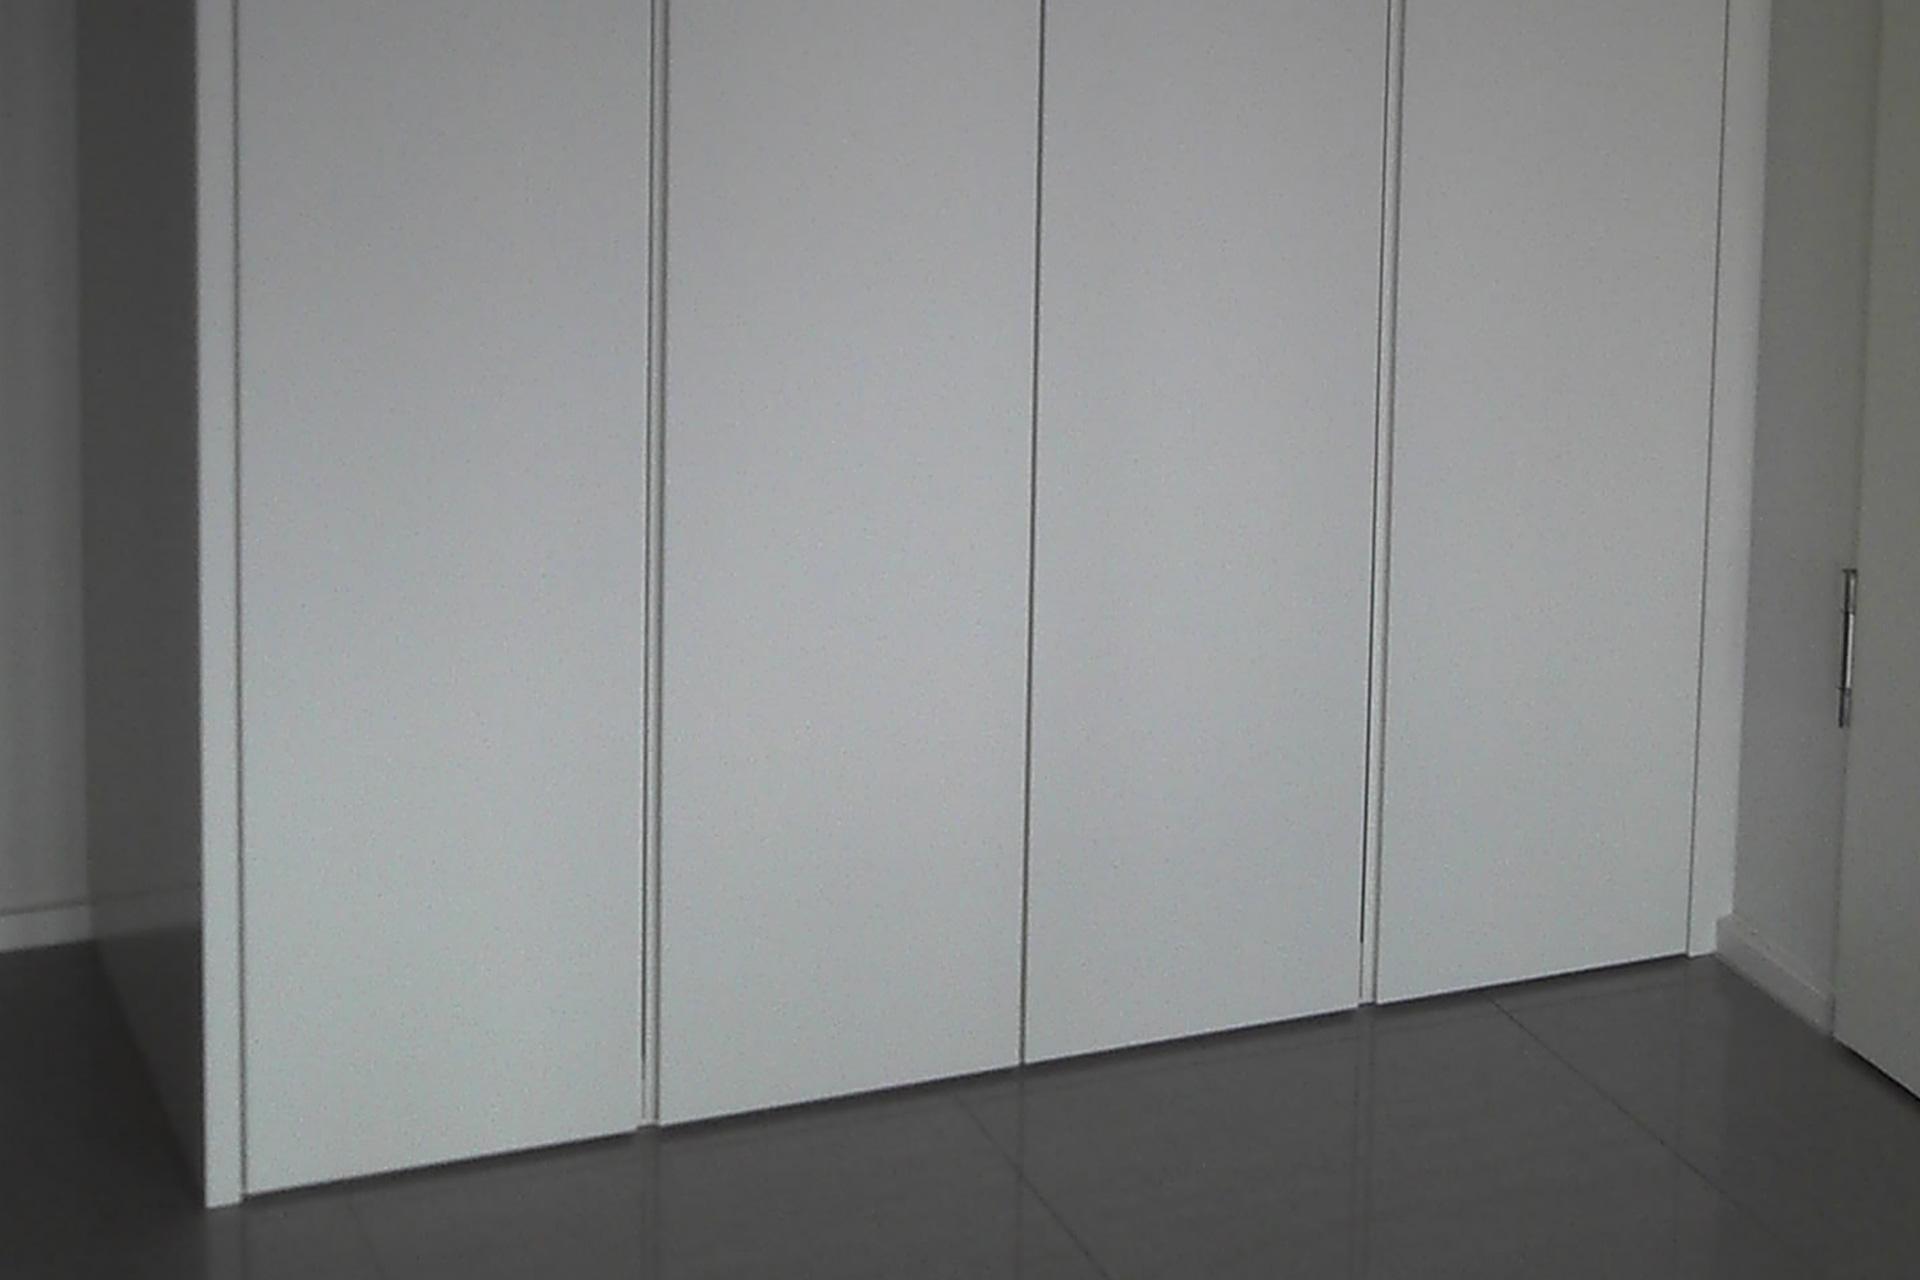 wittlinger-moebelwerkstaette-referenzen-einbaumoebel-015